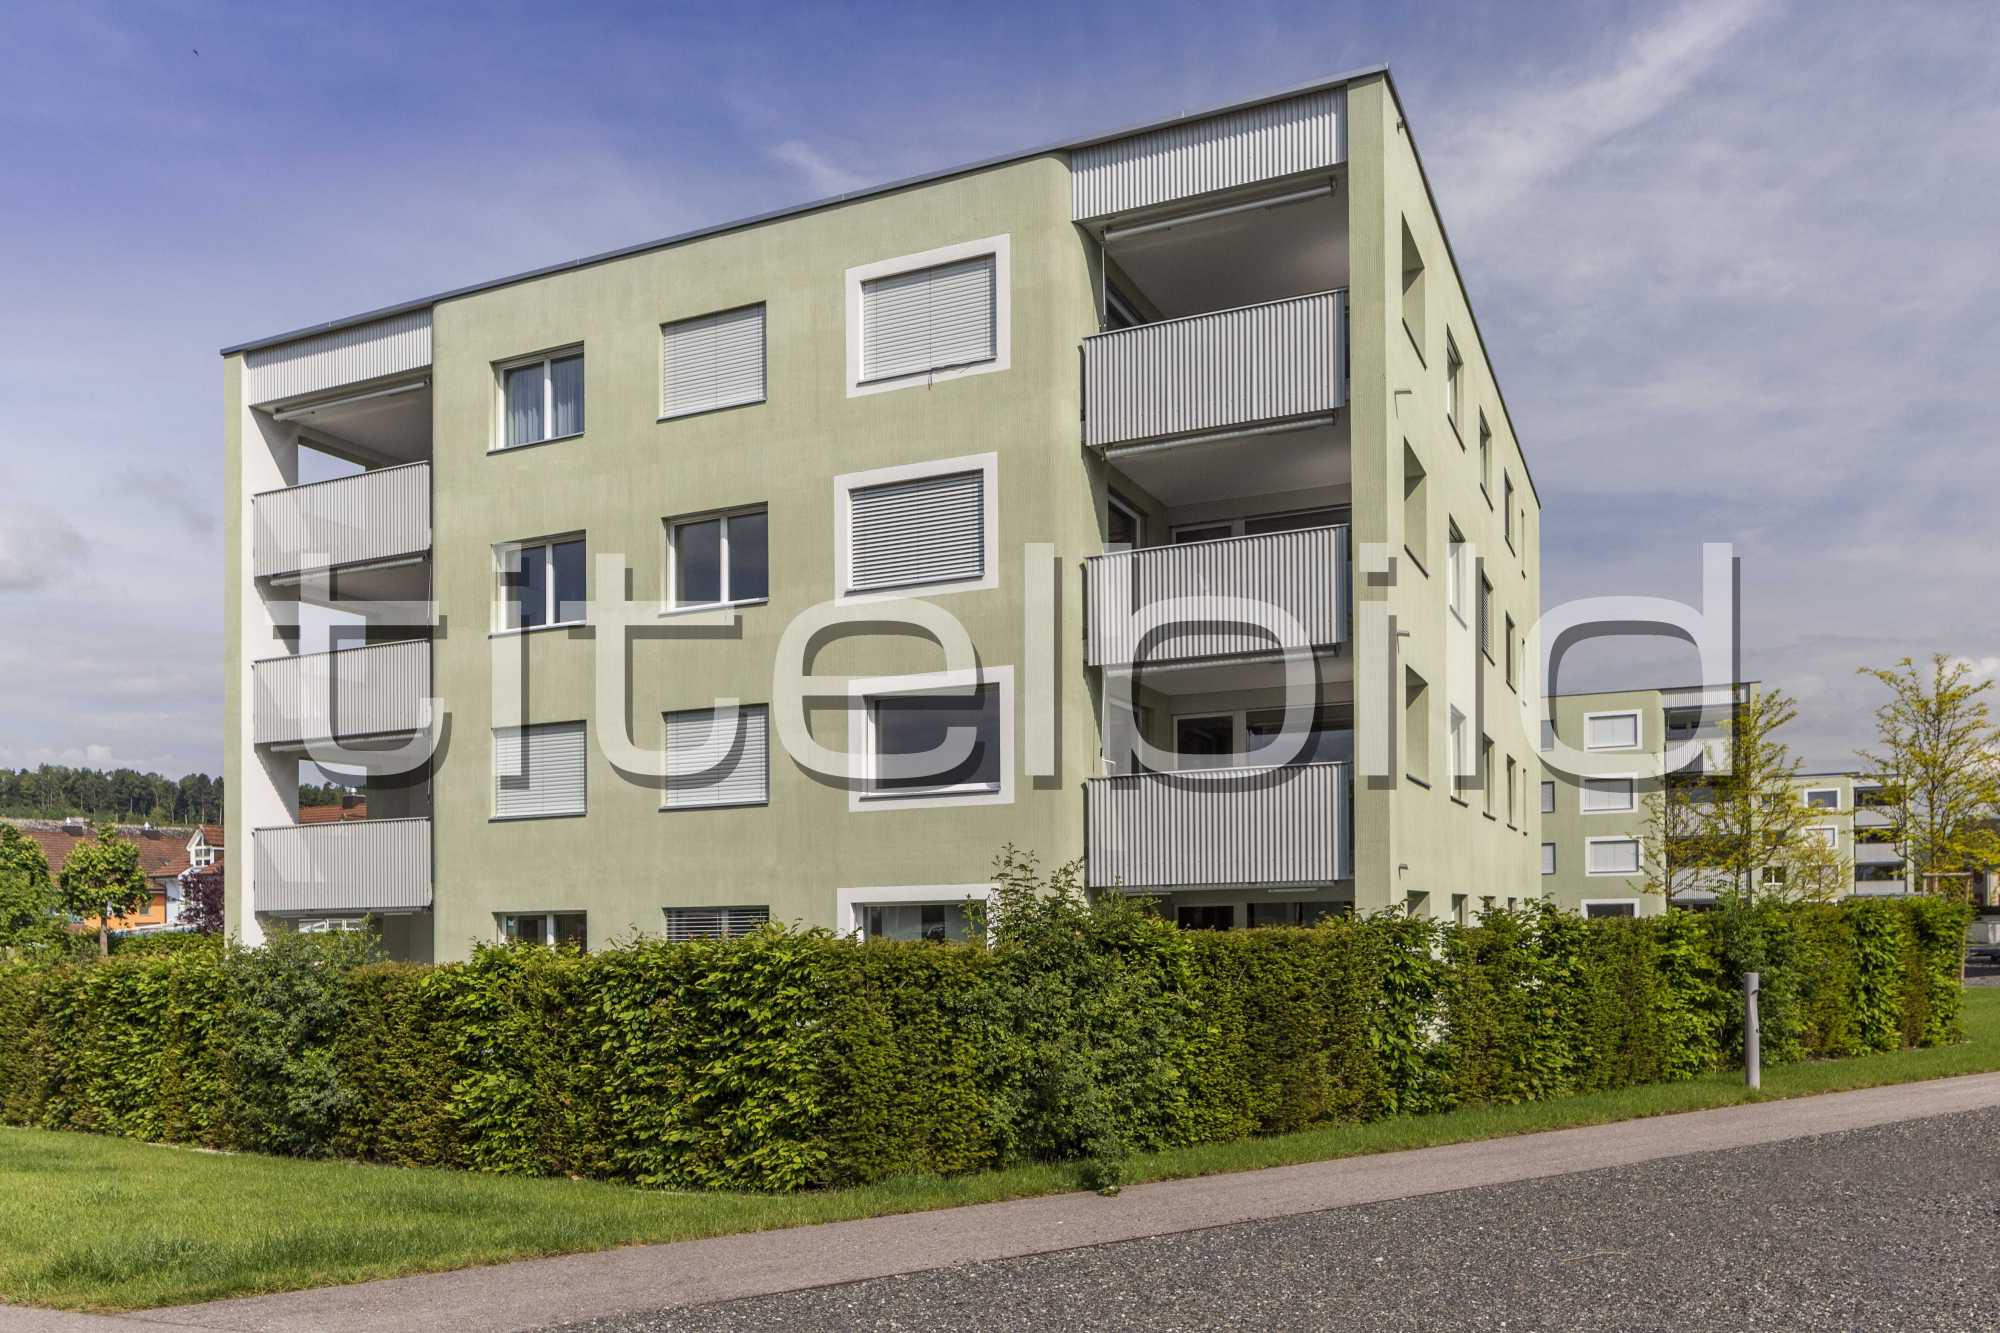 Projektbild-Nr. 4: Parksiedlung Wiggerweg